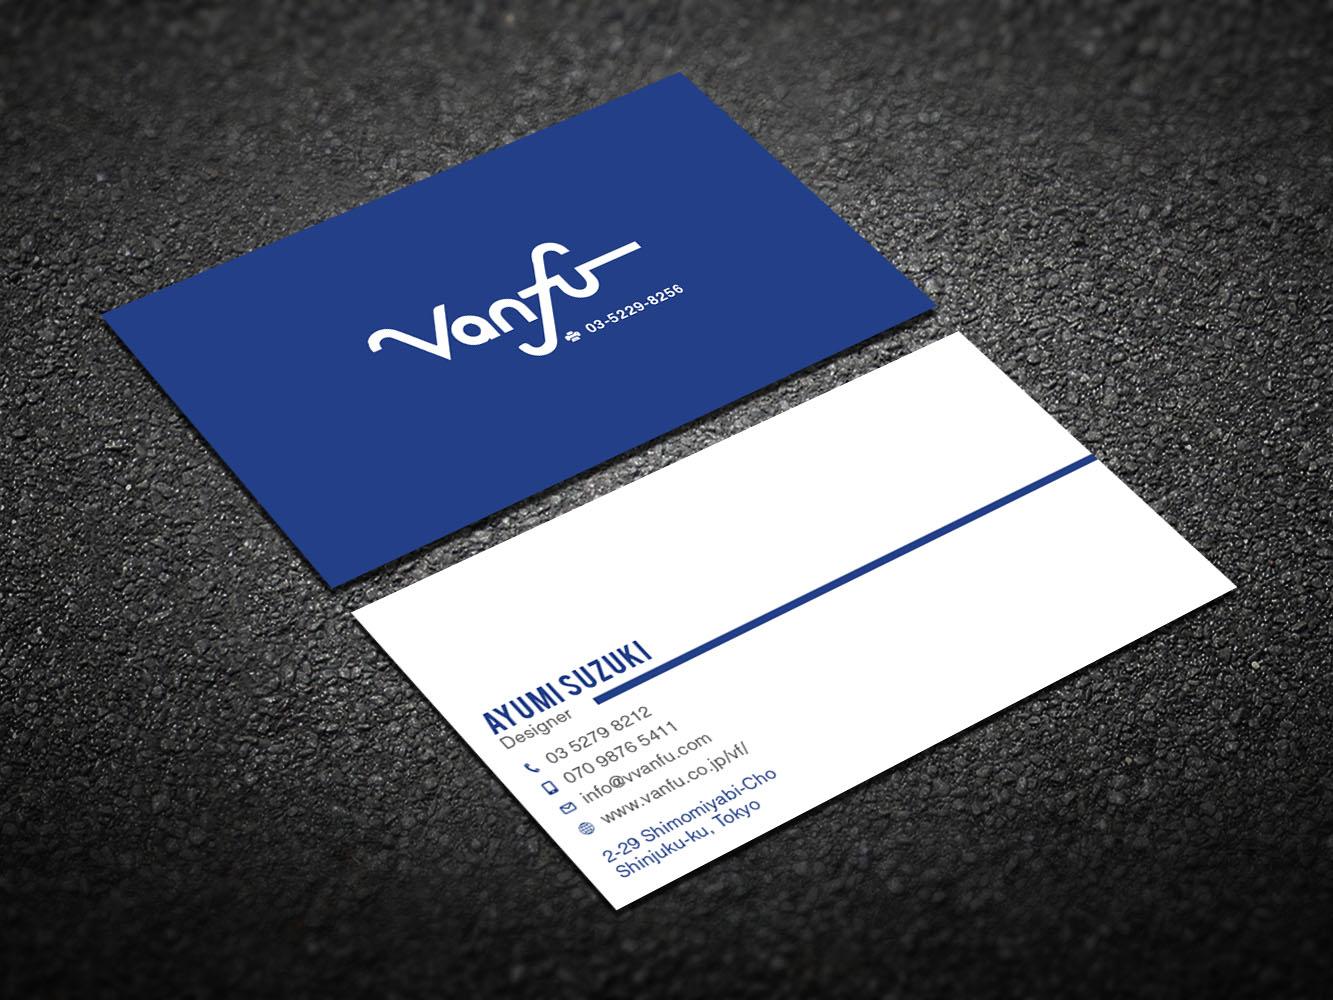 Elegant playful printing business card design for vanfu inc by business card design by design xeneration for vanfu inc design 13944574 reheart Image collections